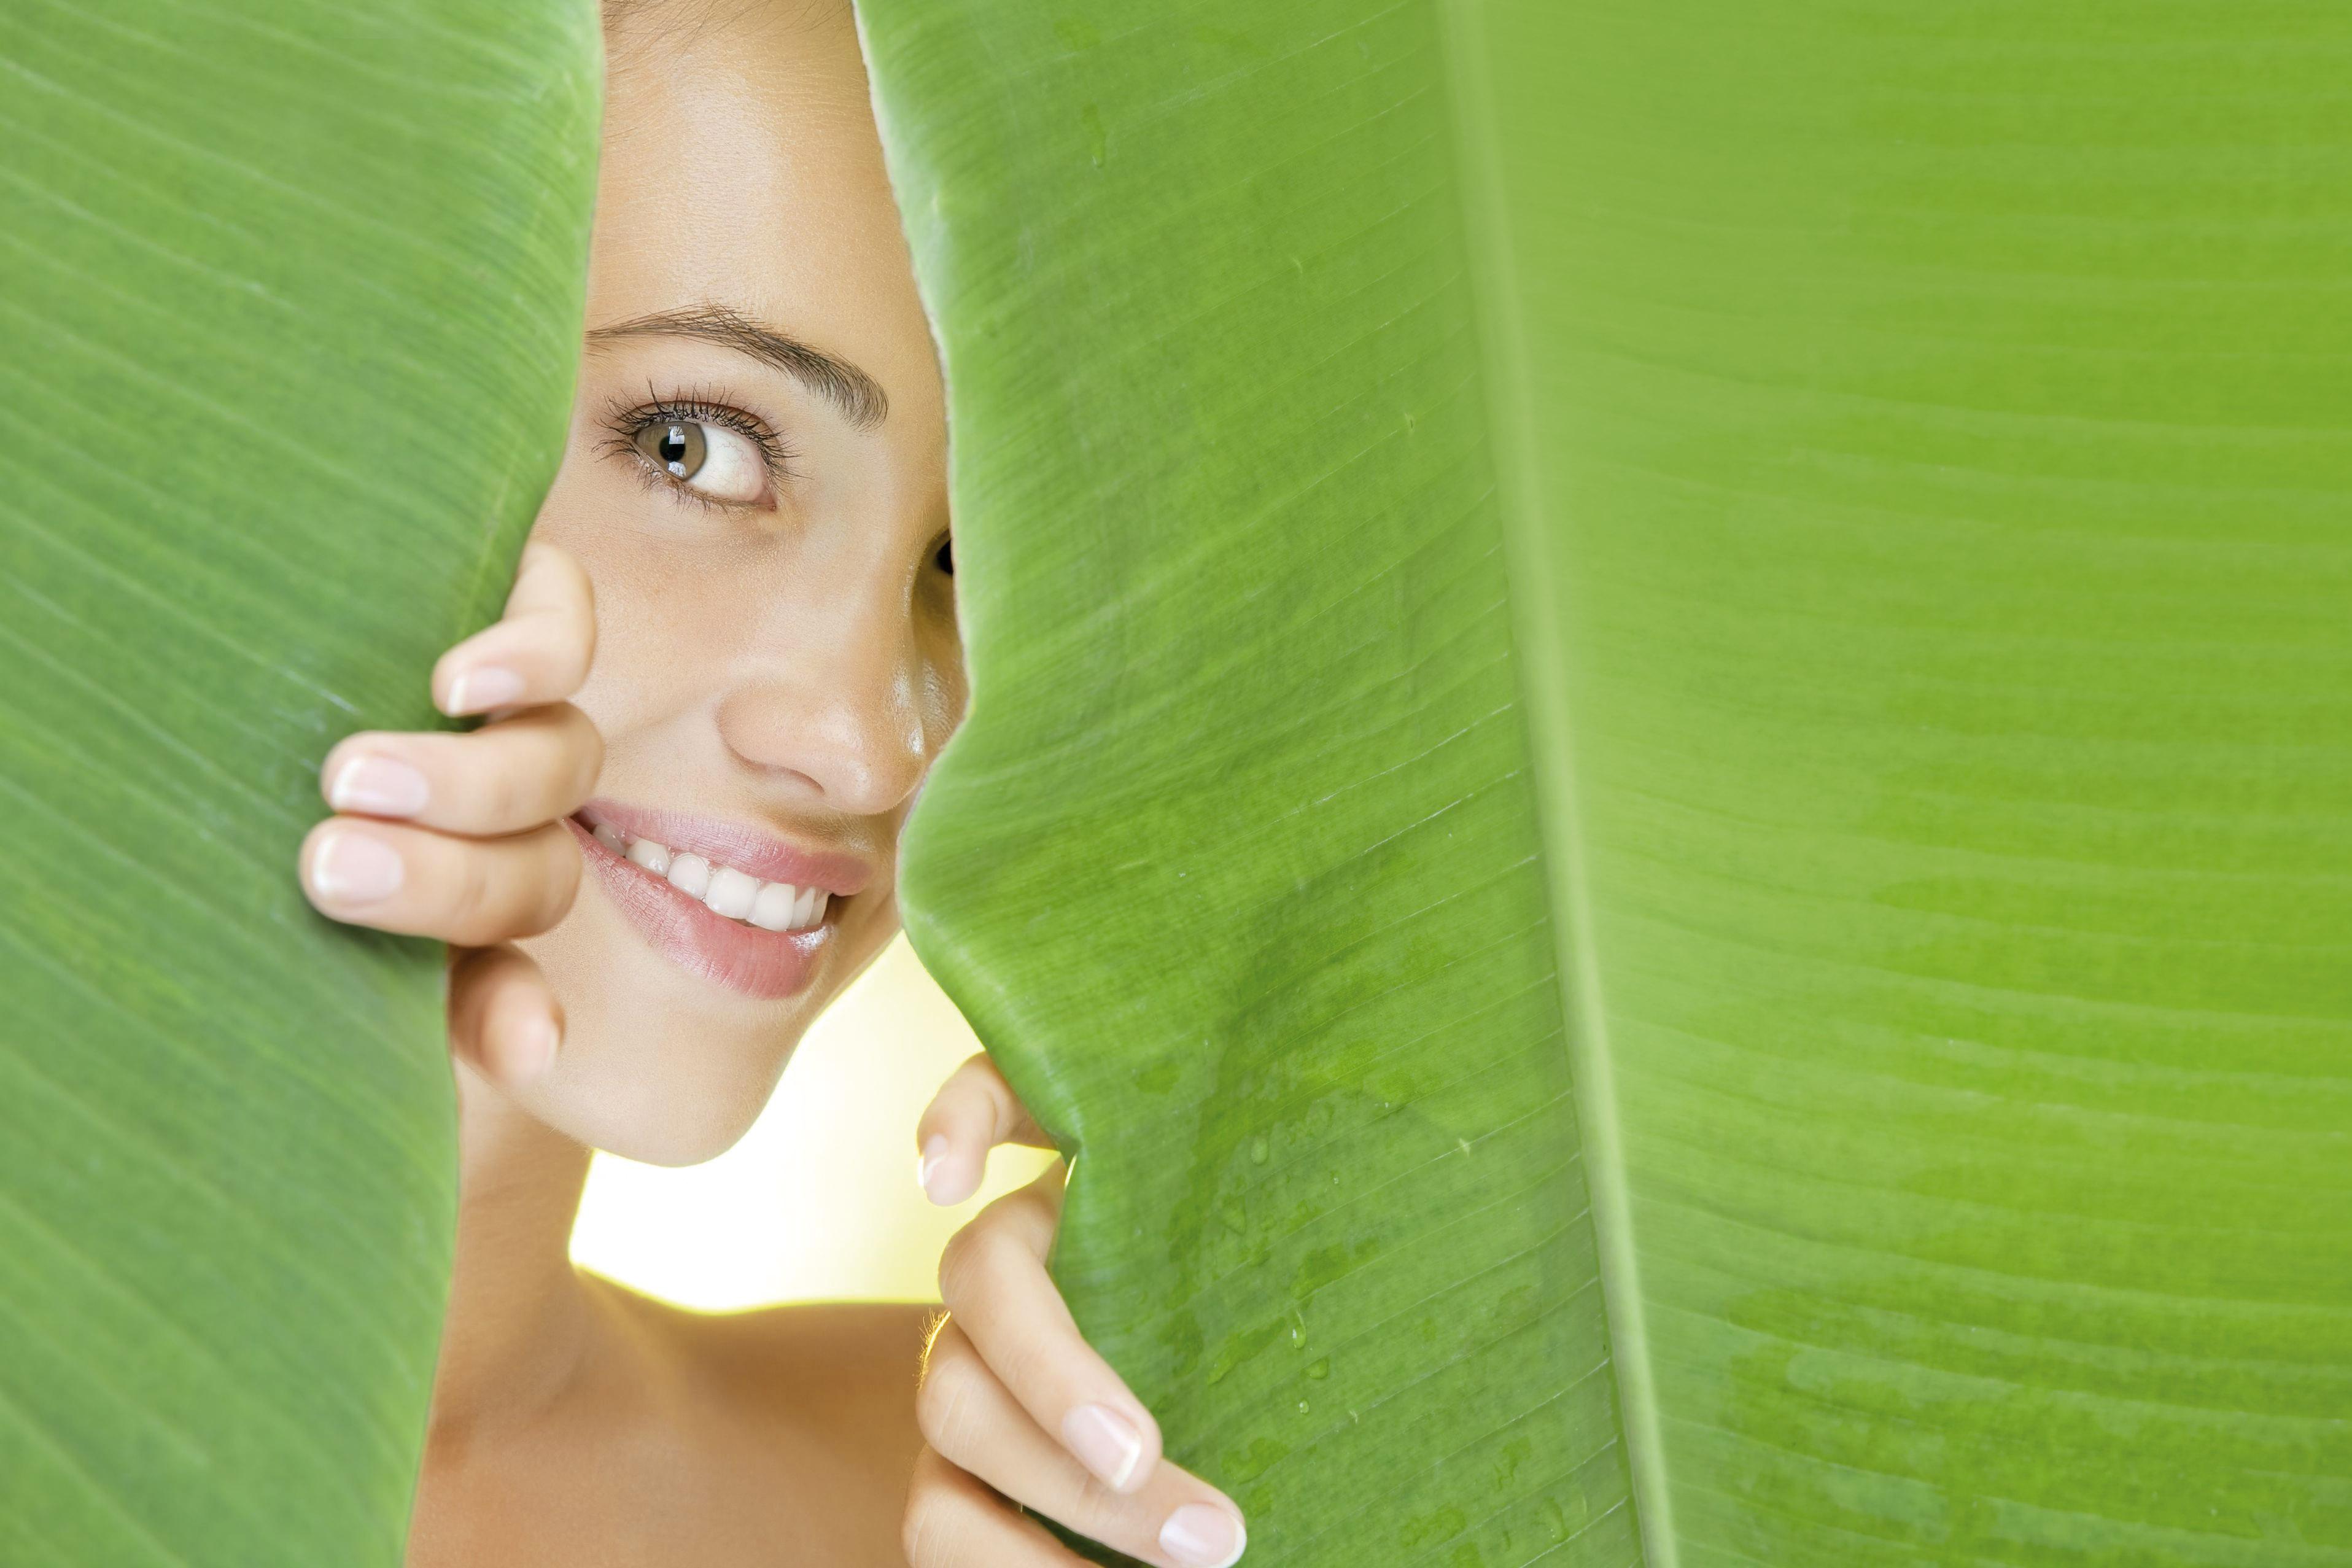 Lachende Frau hinter grünen Blättern